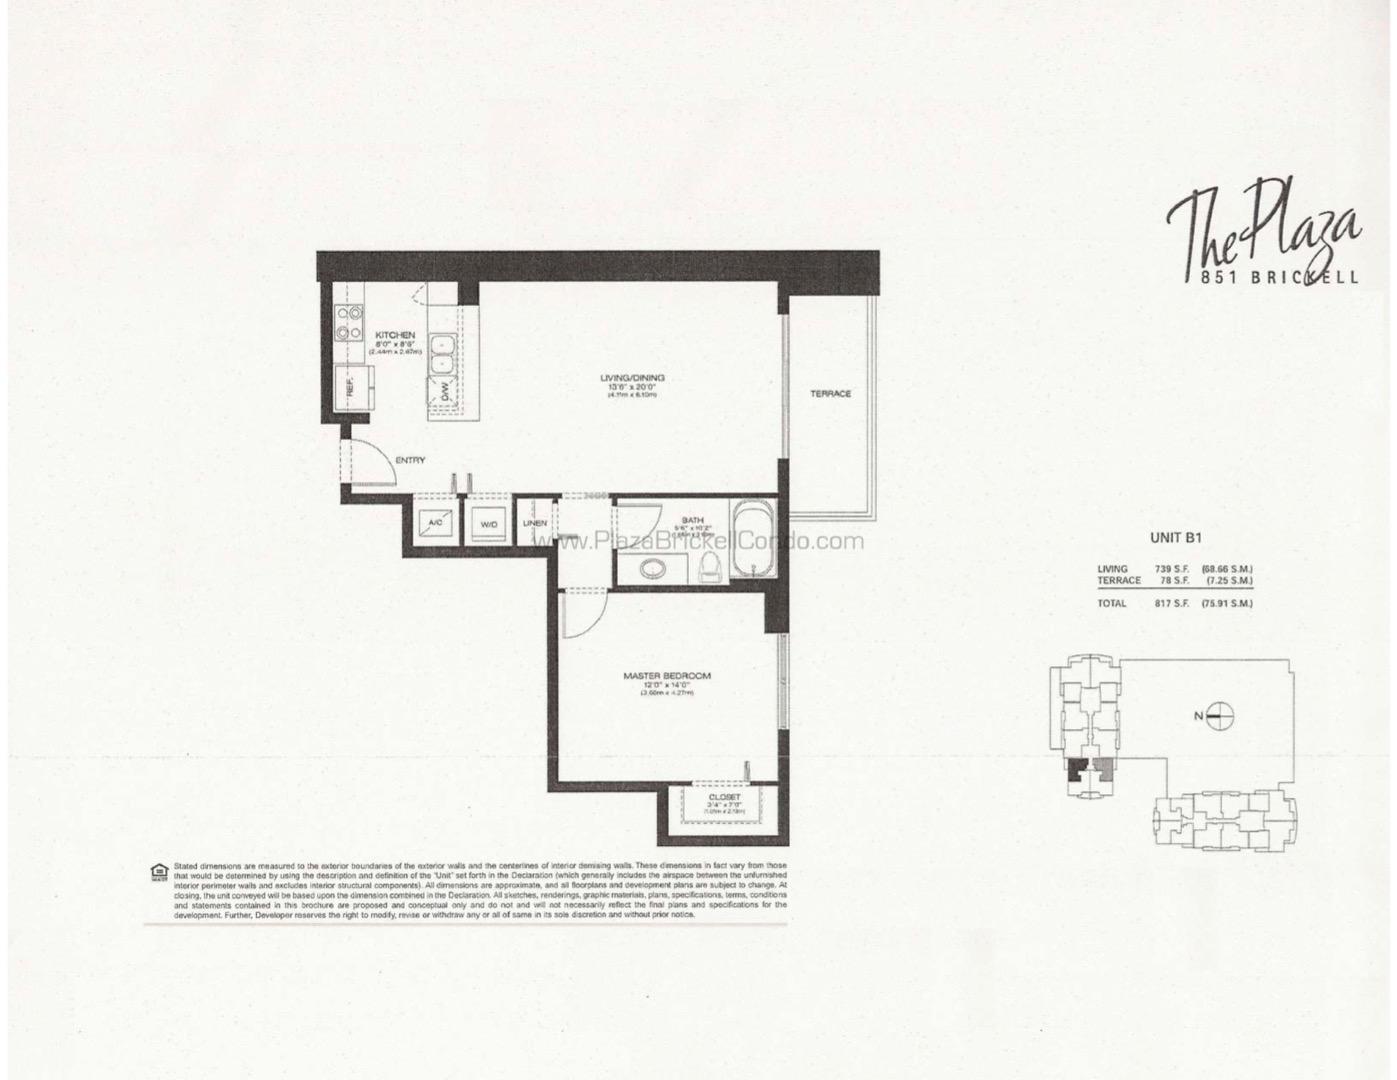 Floor plan image B1 - 1/1  - 750 sqft image